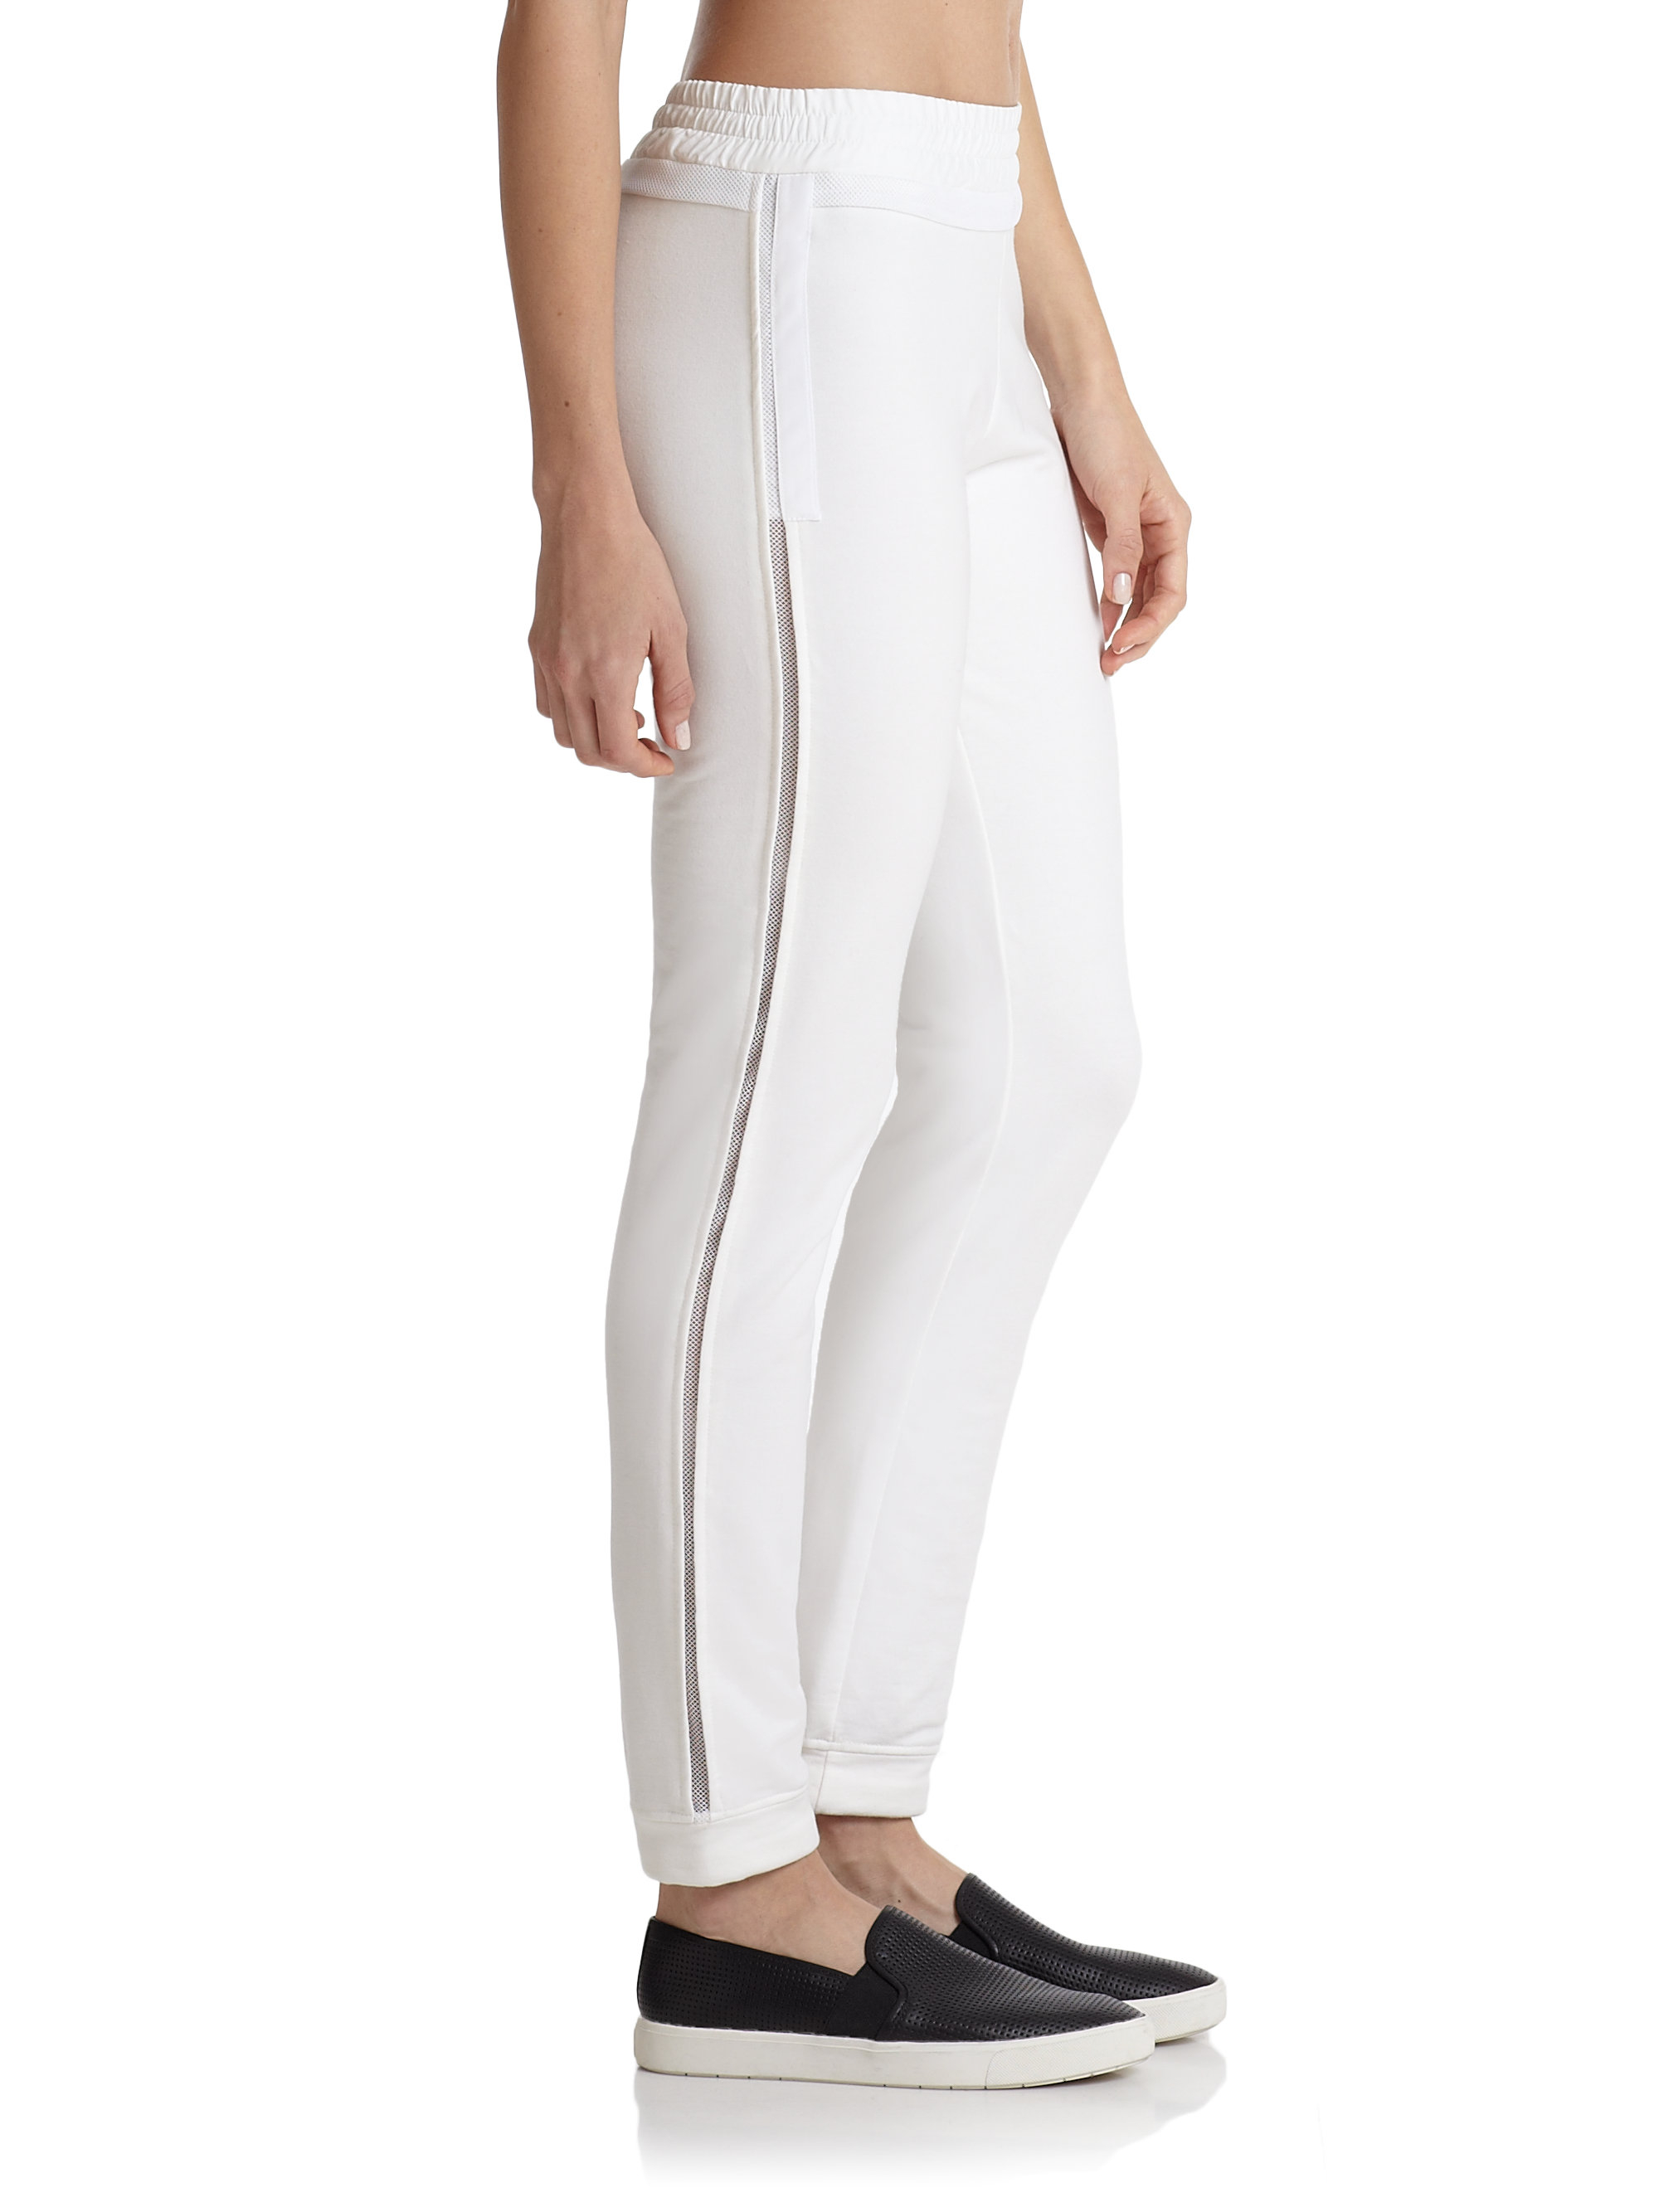 TROUSERS - Casual trousers Callens 0bqJuMV1h